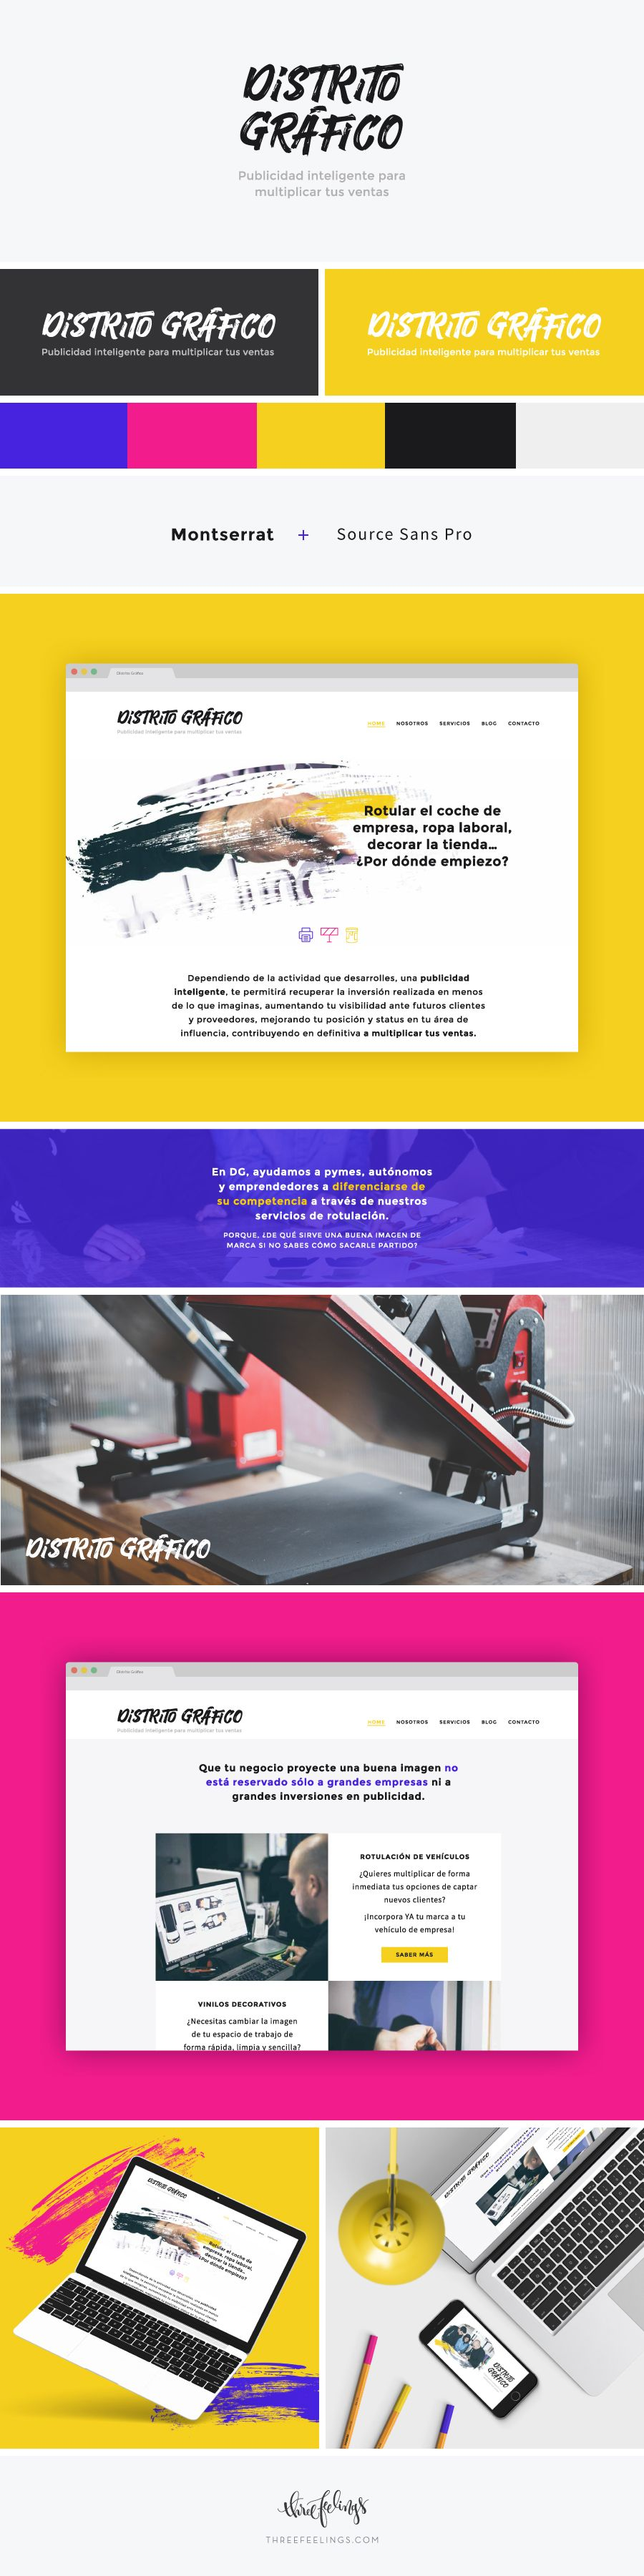 portfolio-diseno-identidad-instalacion-plantilla-distritografico-threefeelings-01